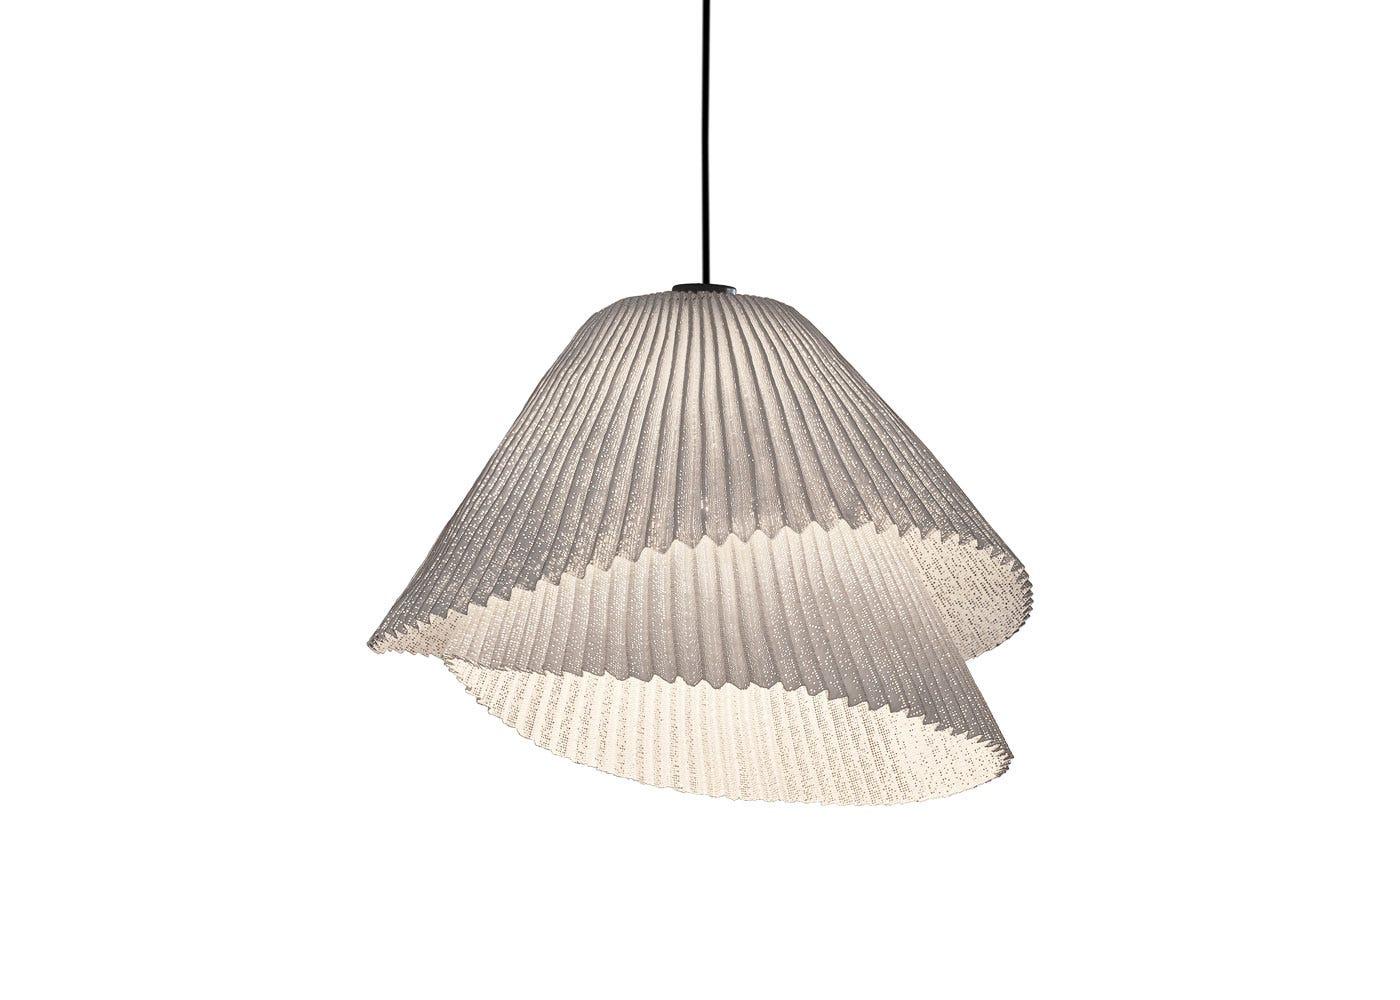 As Shown: Tempo Vivace Pendant Lamp Outdoor